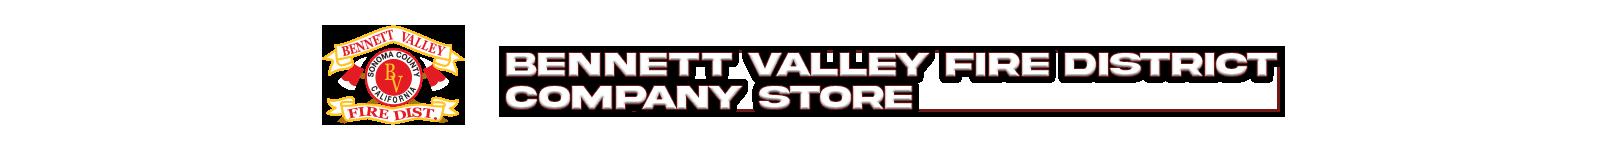 Bennett Valley Fire Company Store Logo